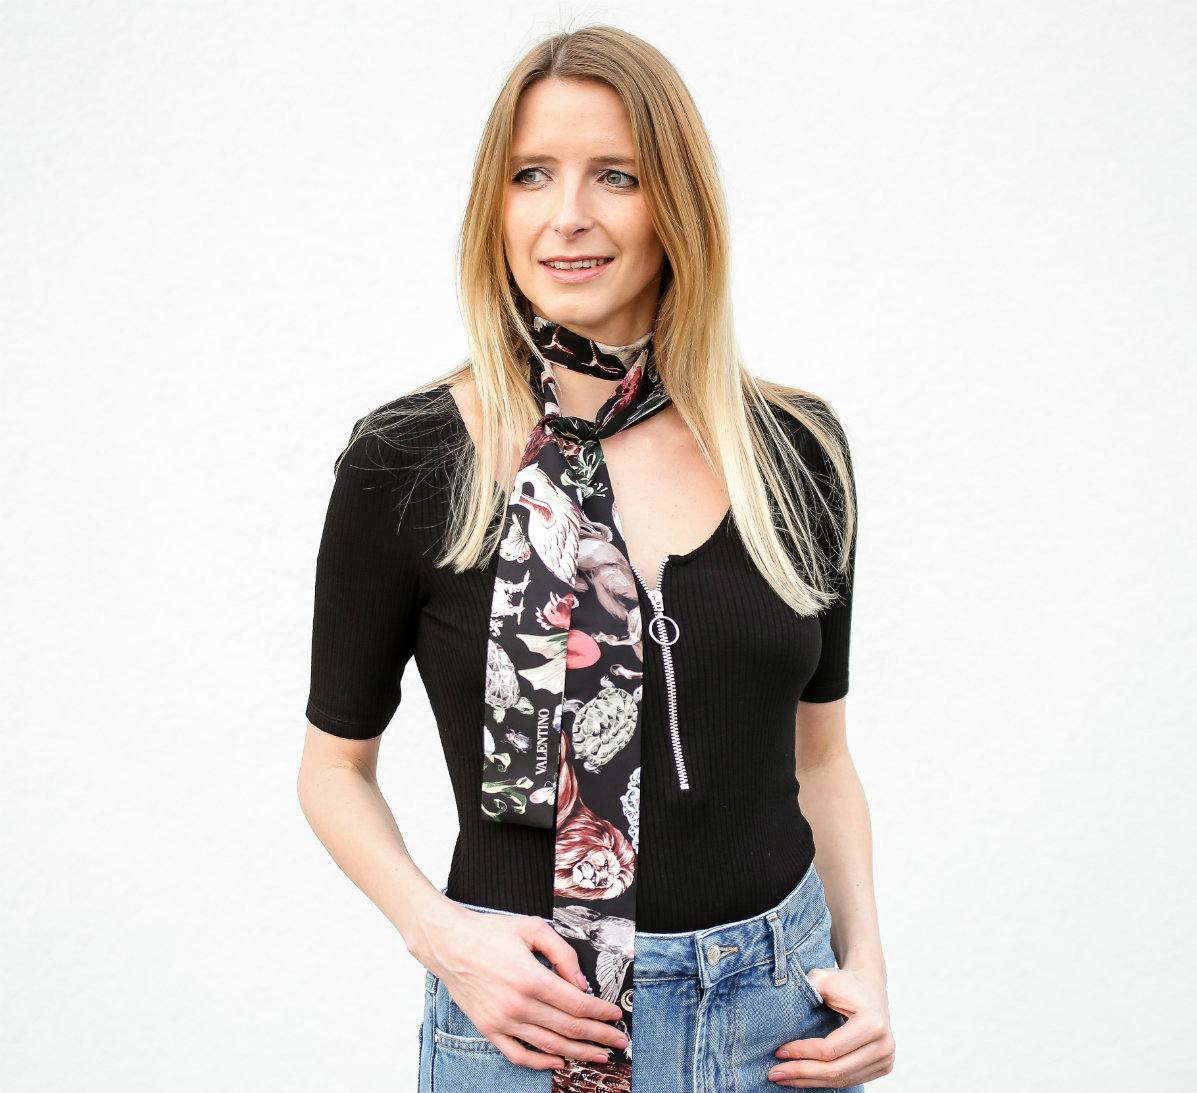 Fashion_Outfit_Zip_Zipper_Body_Valentino_Scarf-12_pixlr